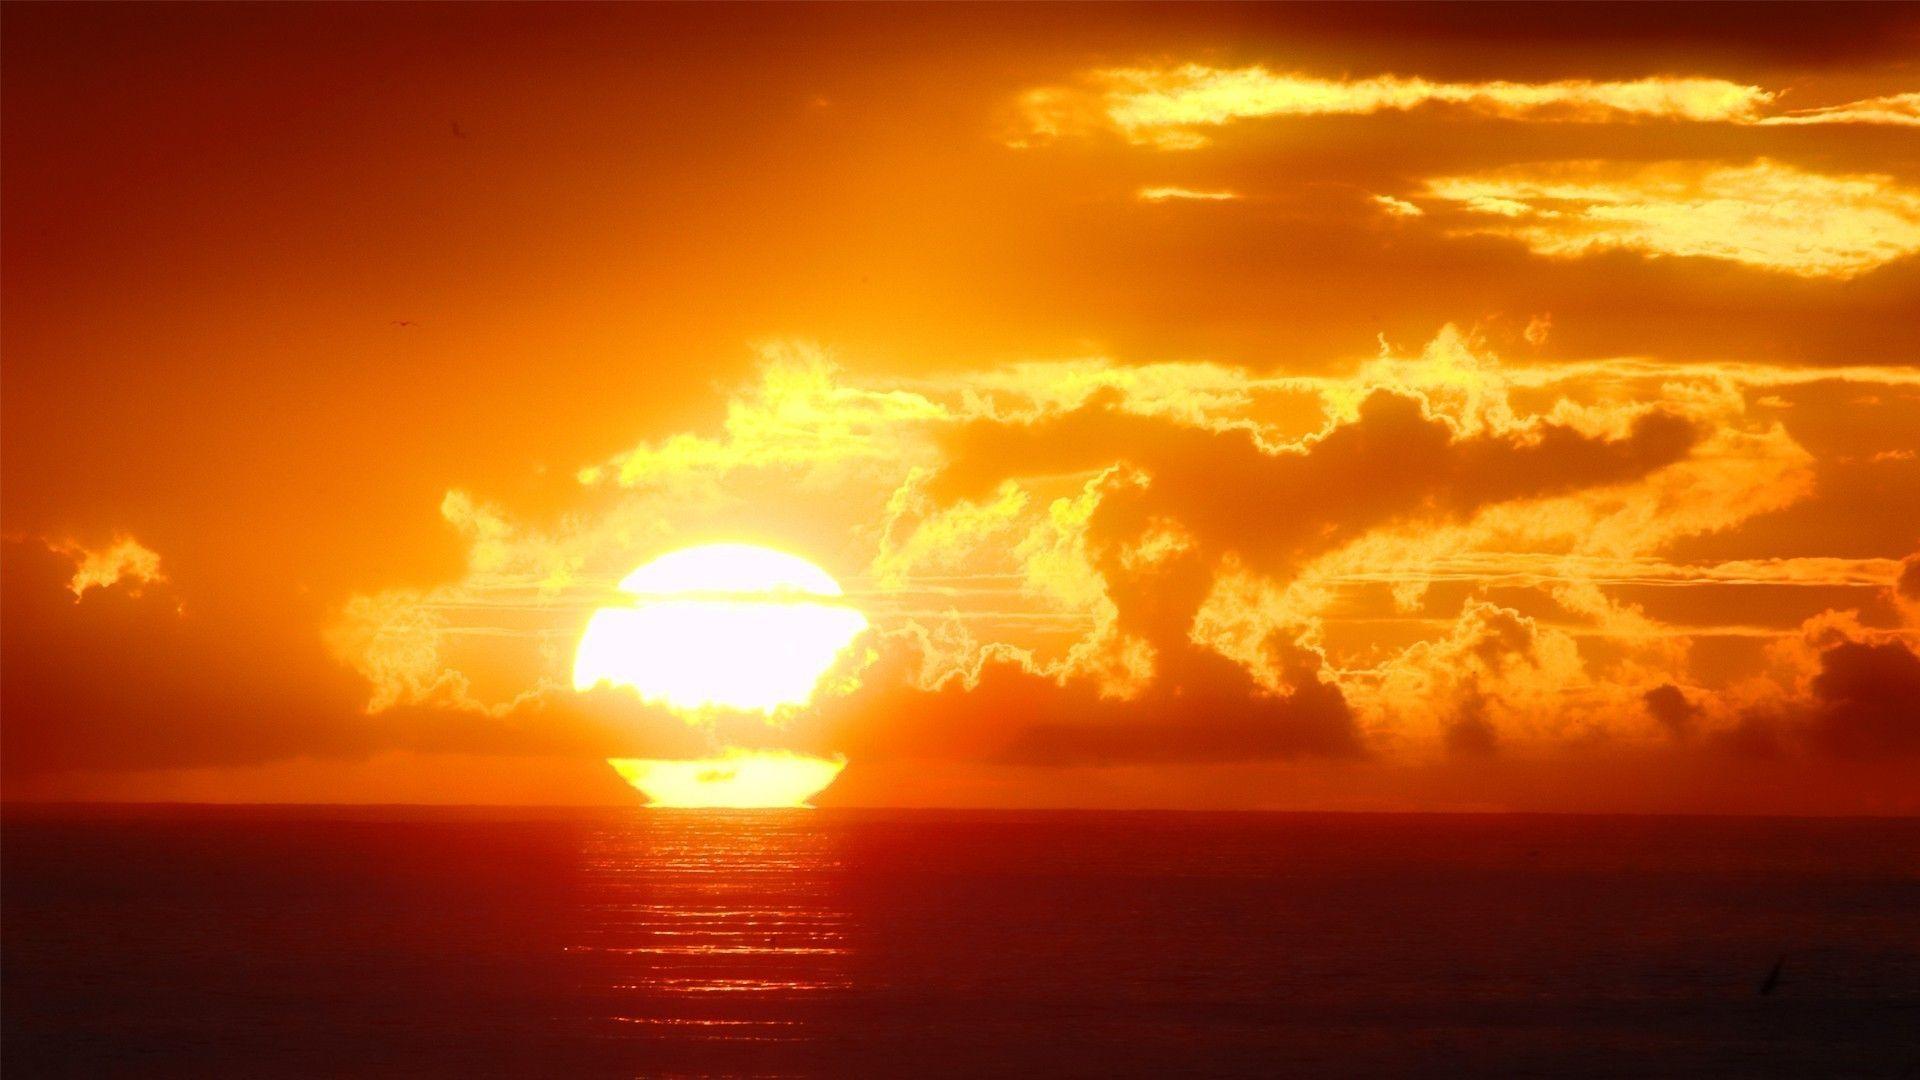 Digital Picture//Photo//Wallpaper//Desktop Background-Greece//Sunset-#1104